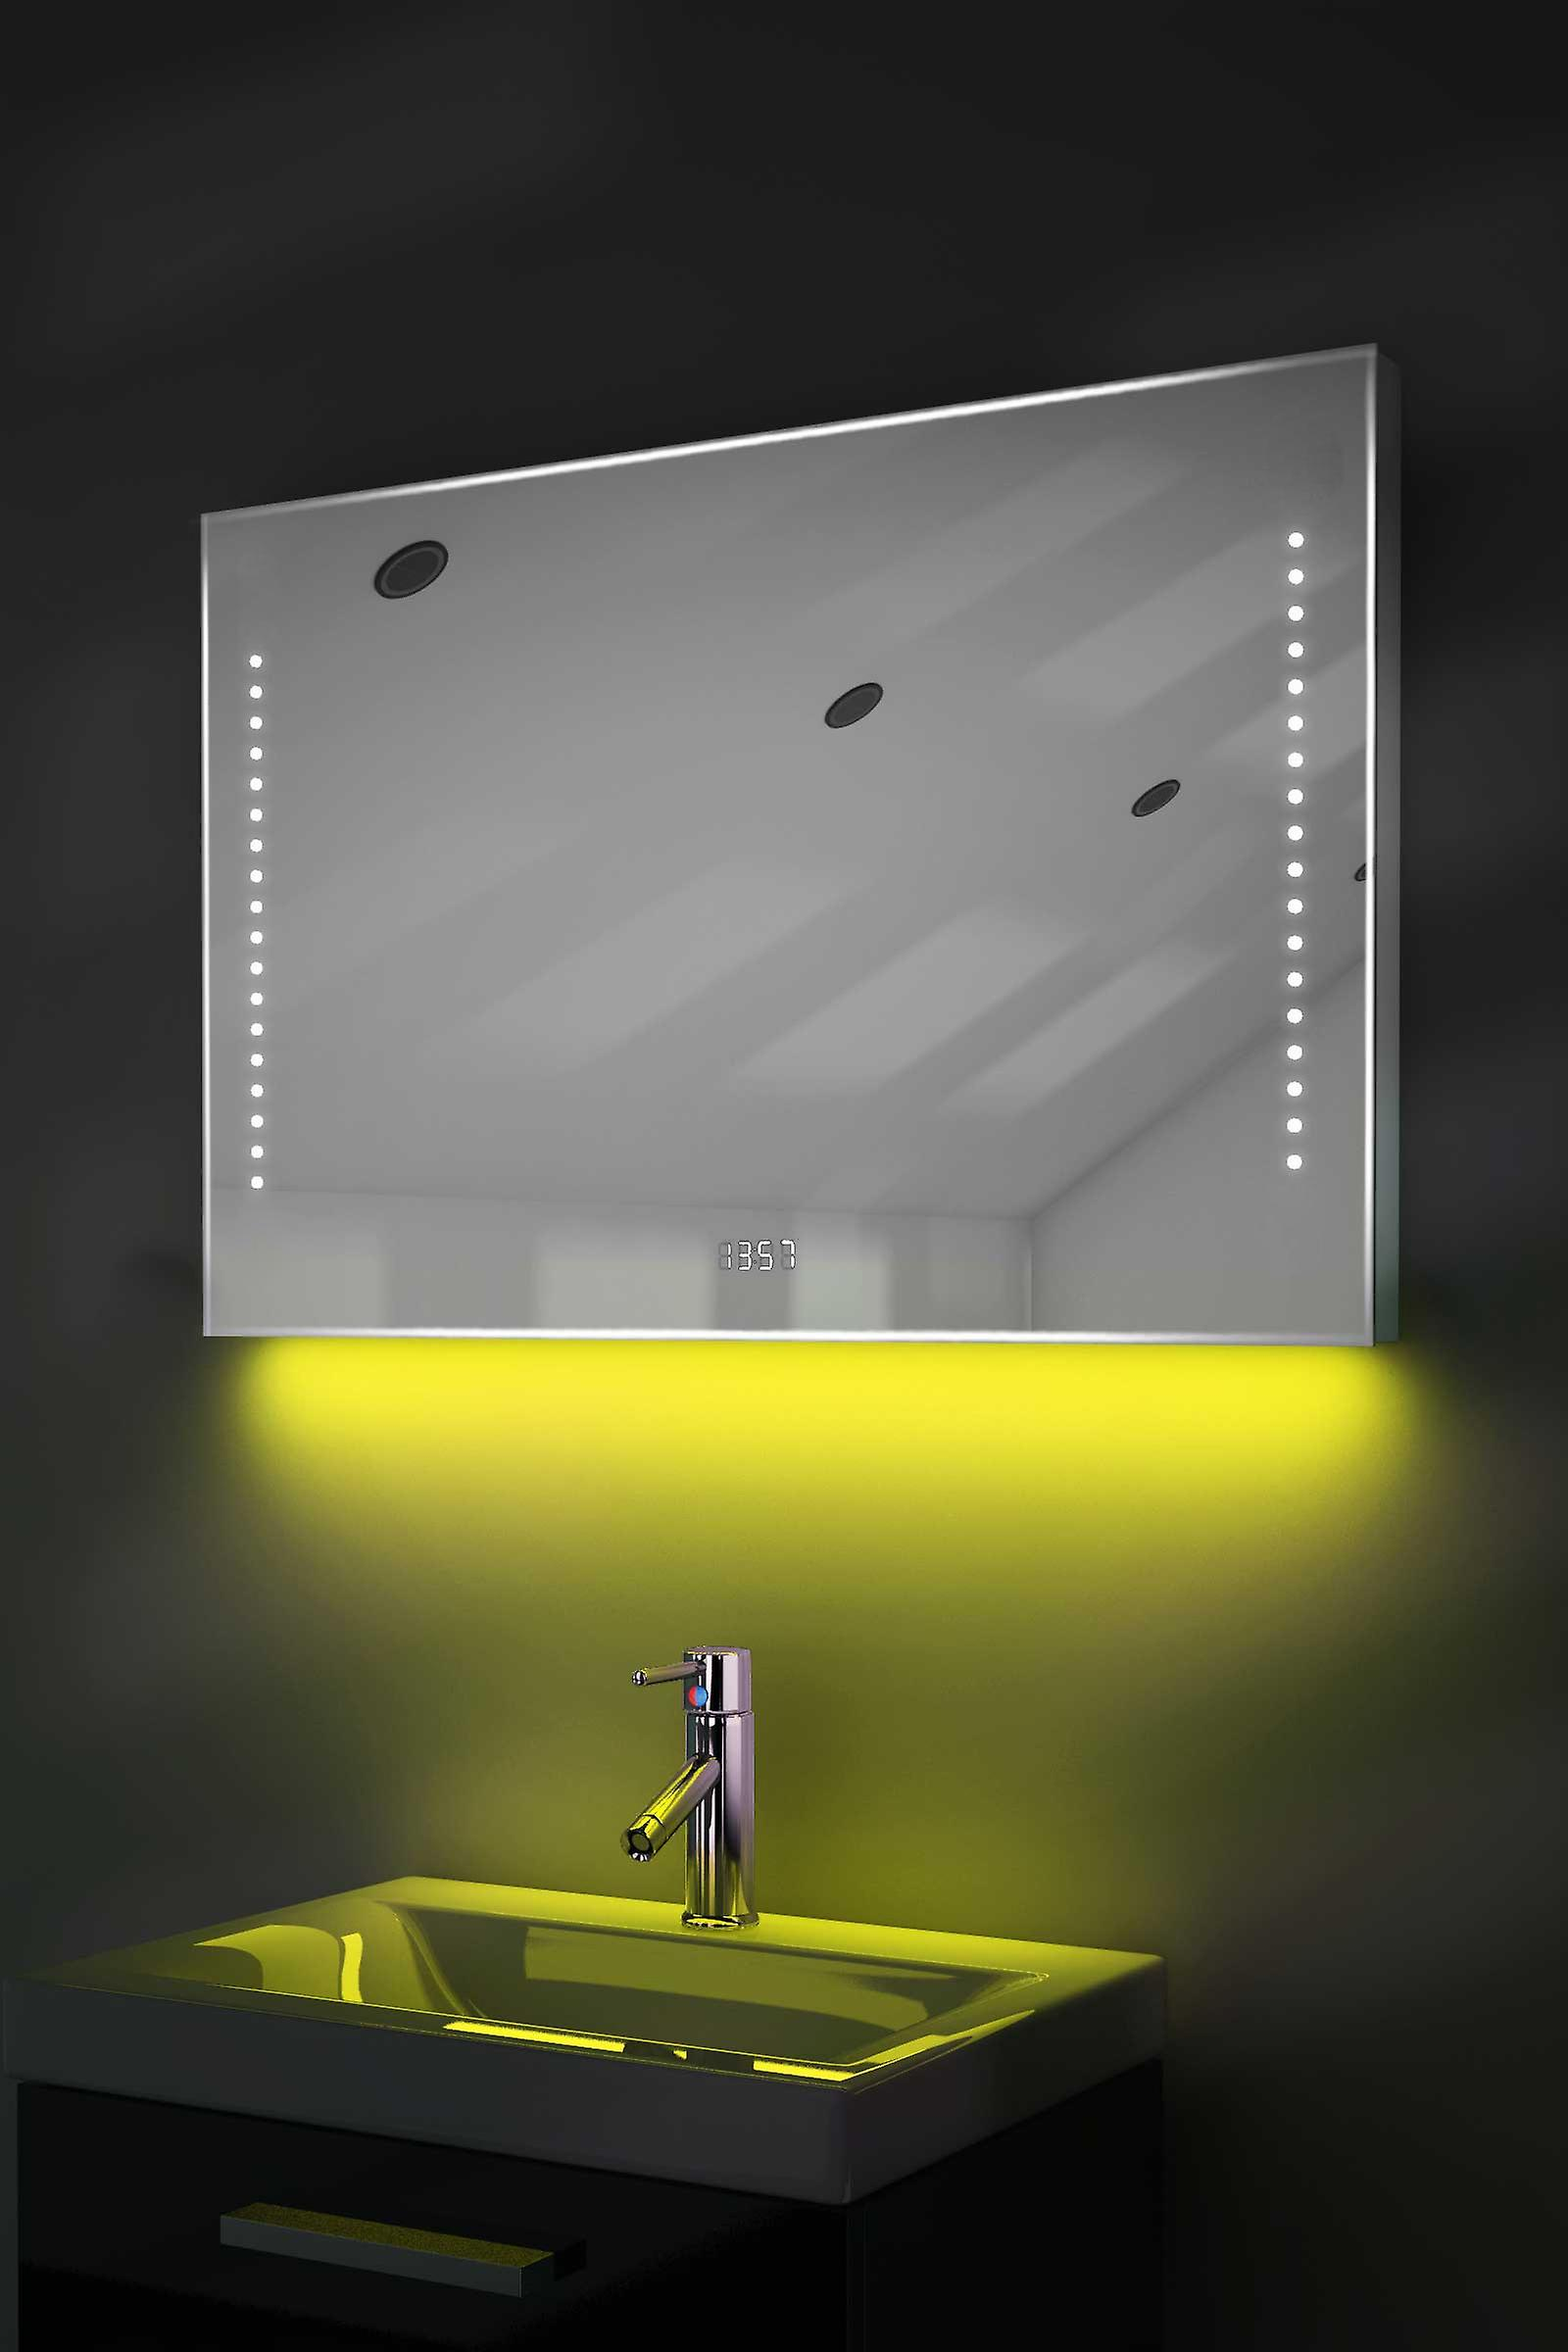 Digital Clock Slim Mirror with Under Lighting, Demist & Sensor k194w